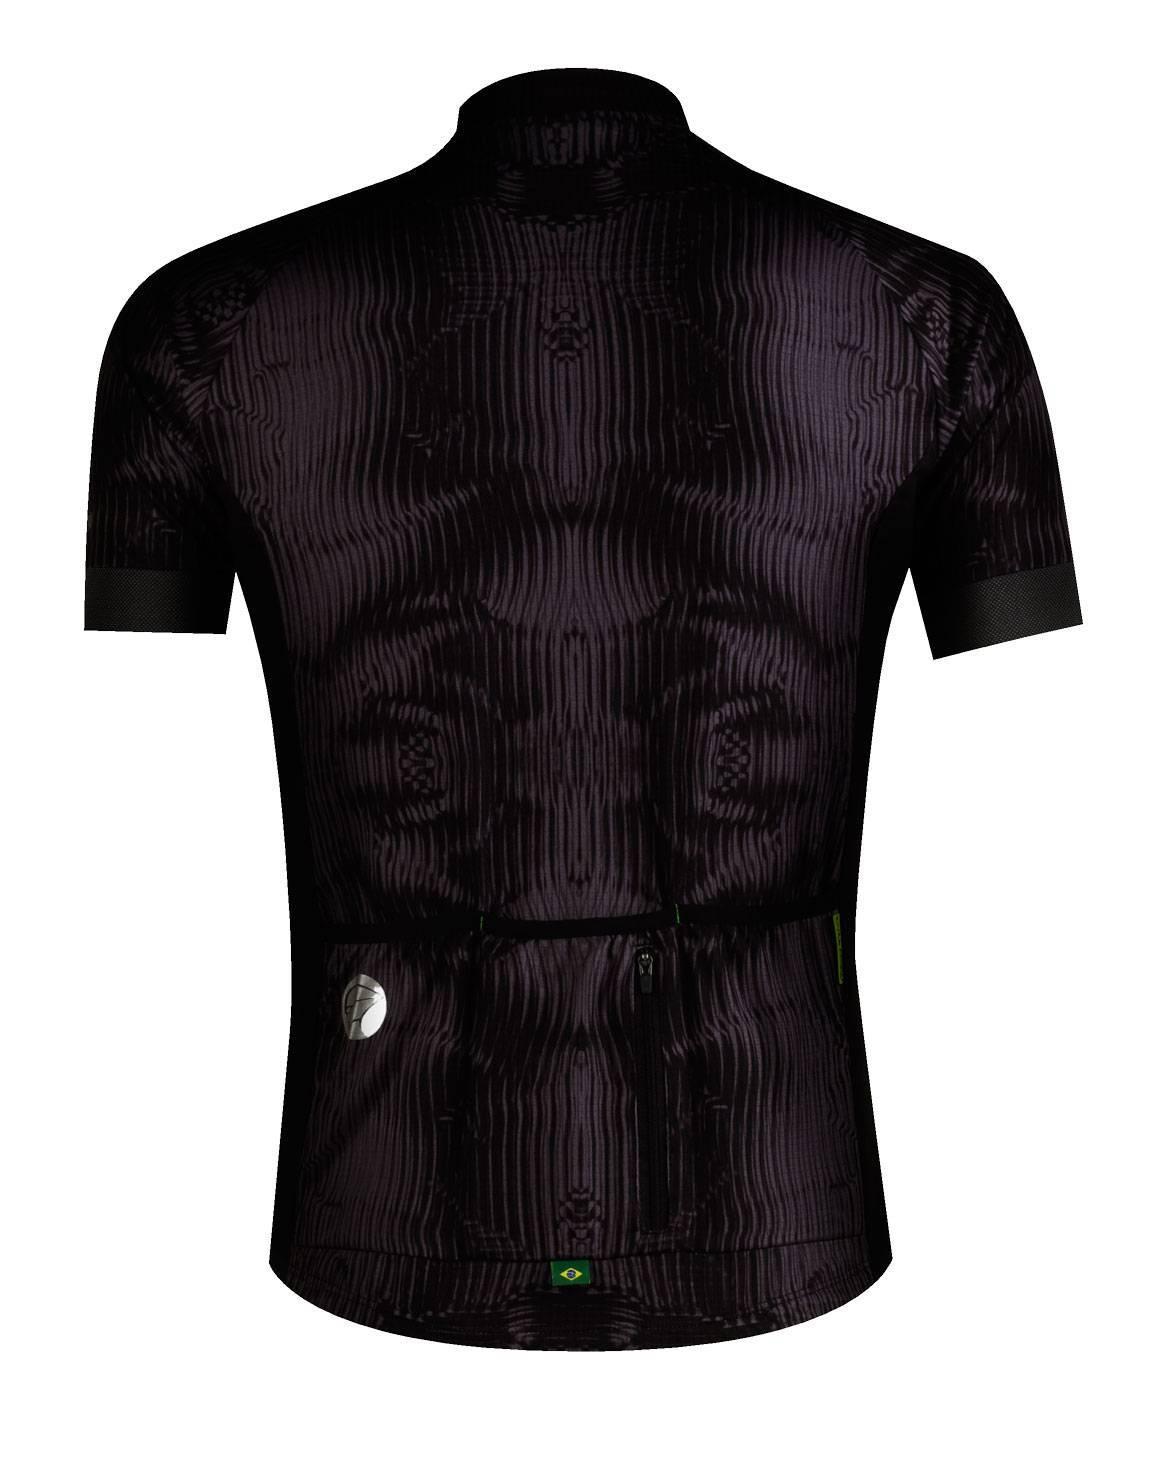 Camisa Mauro Ribeiro Glass 2019 - BIKE ALLA CARTE